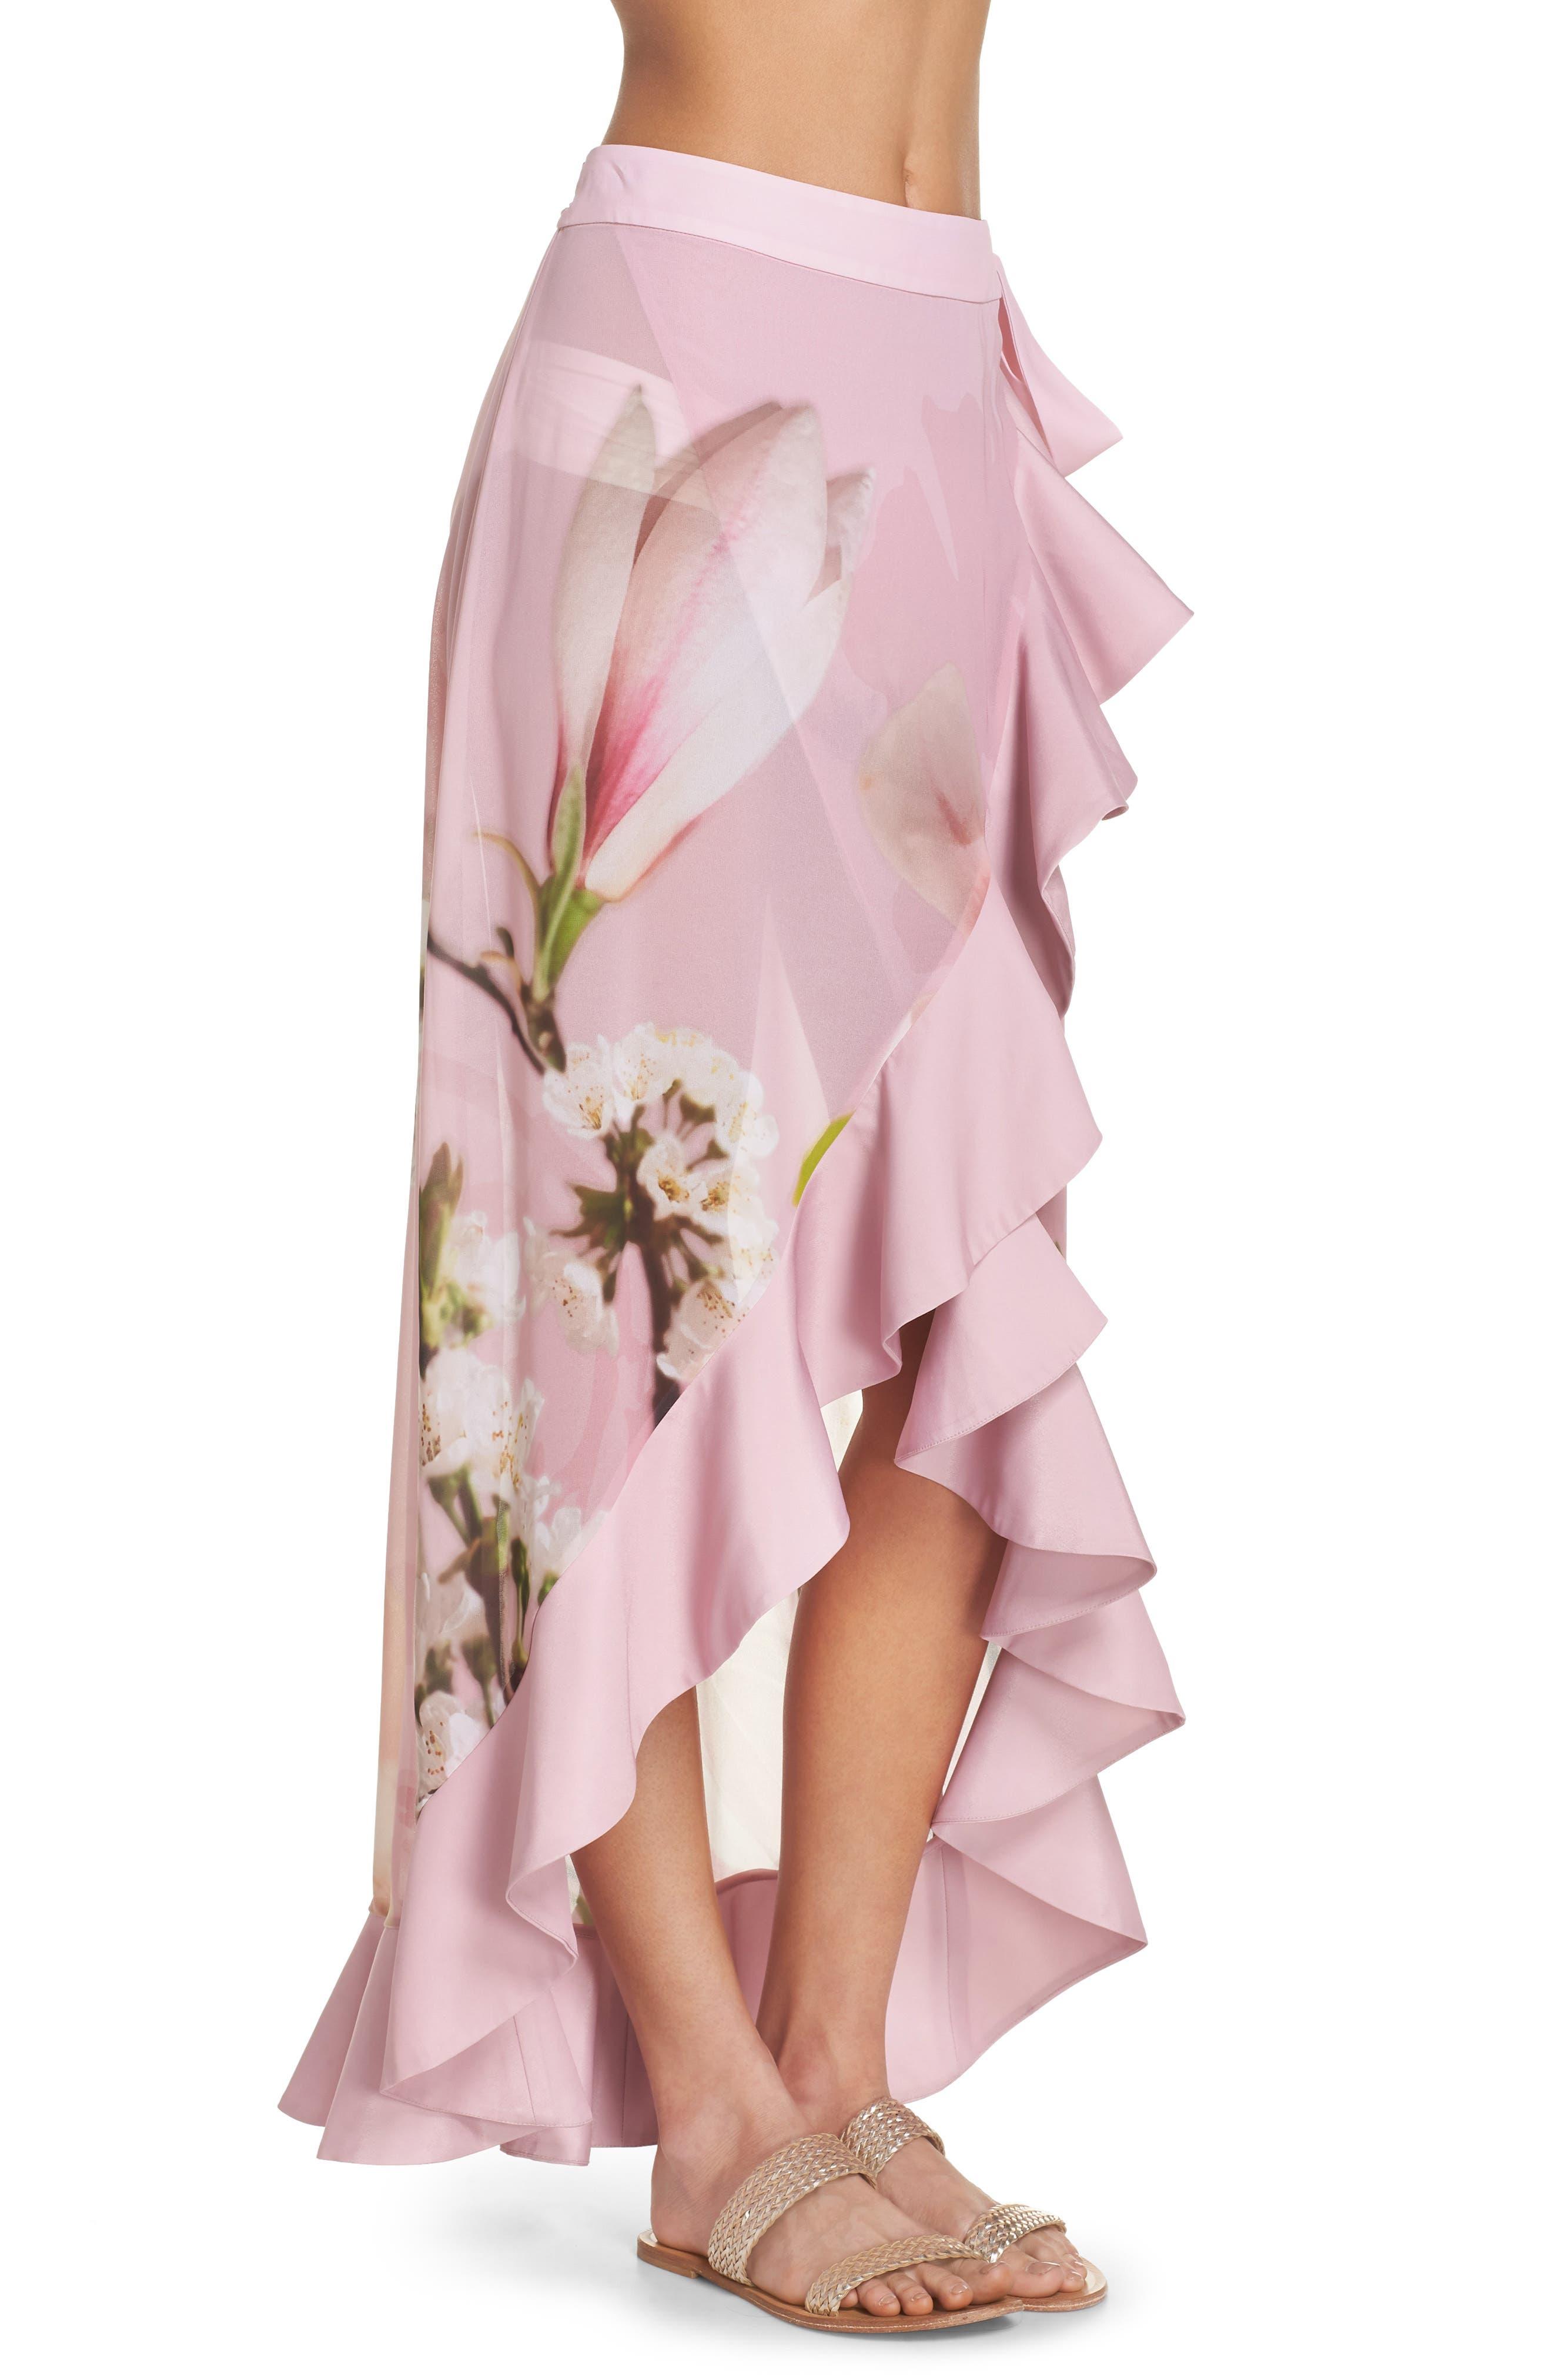 Harmony Cover-Up Skirt,                             Alternate thumbnail 3, color,                             Dusky Pink